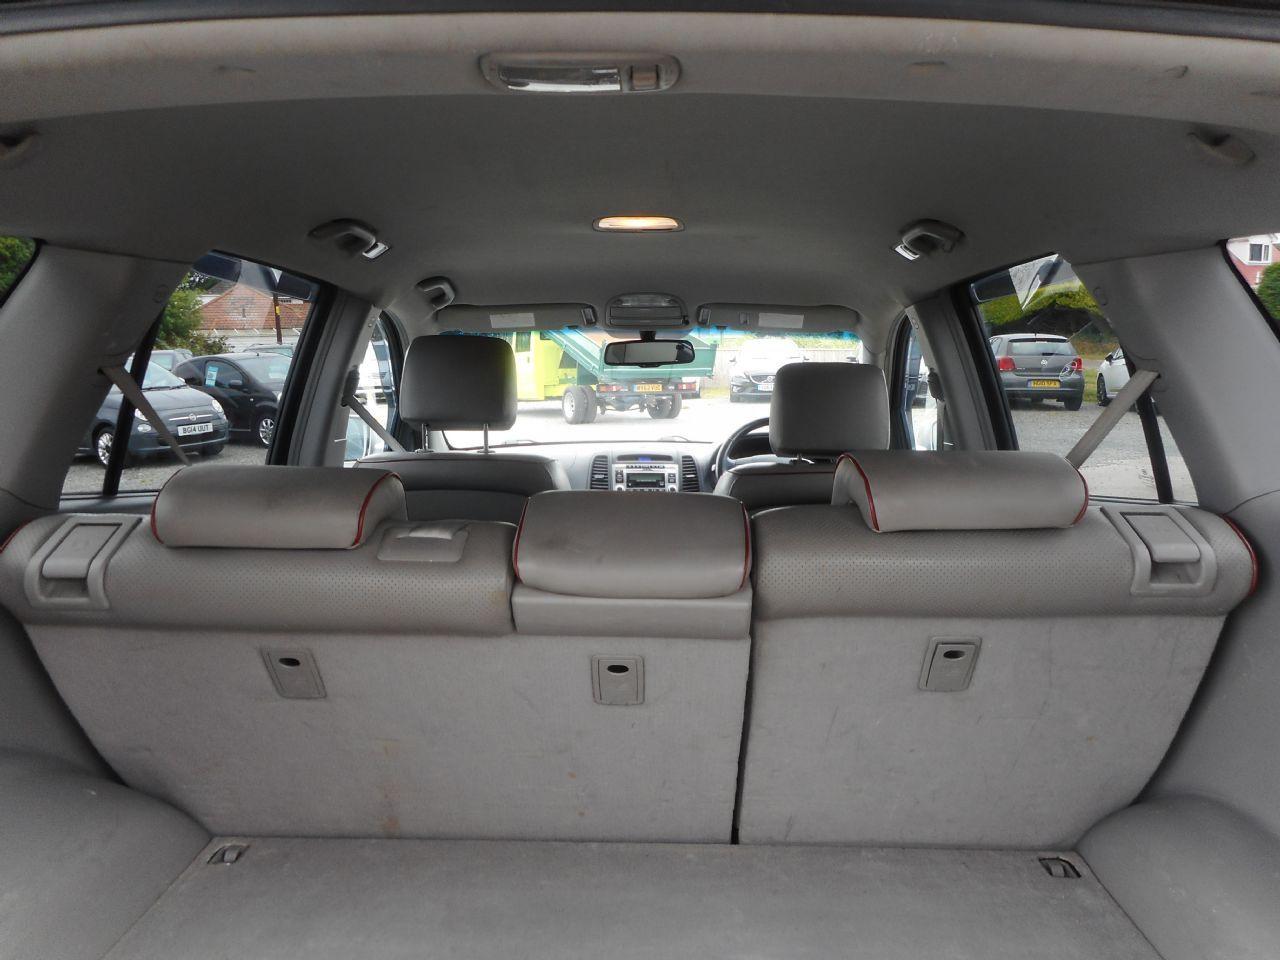 HYUNDAI Santa Fe 2.2 CRTD CDX 5 Seat EU4 (2008) - Picture 16